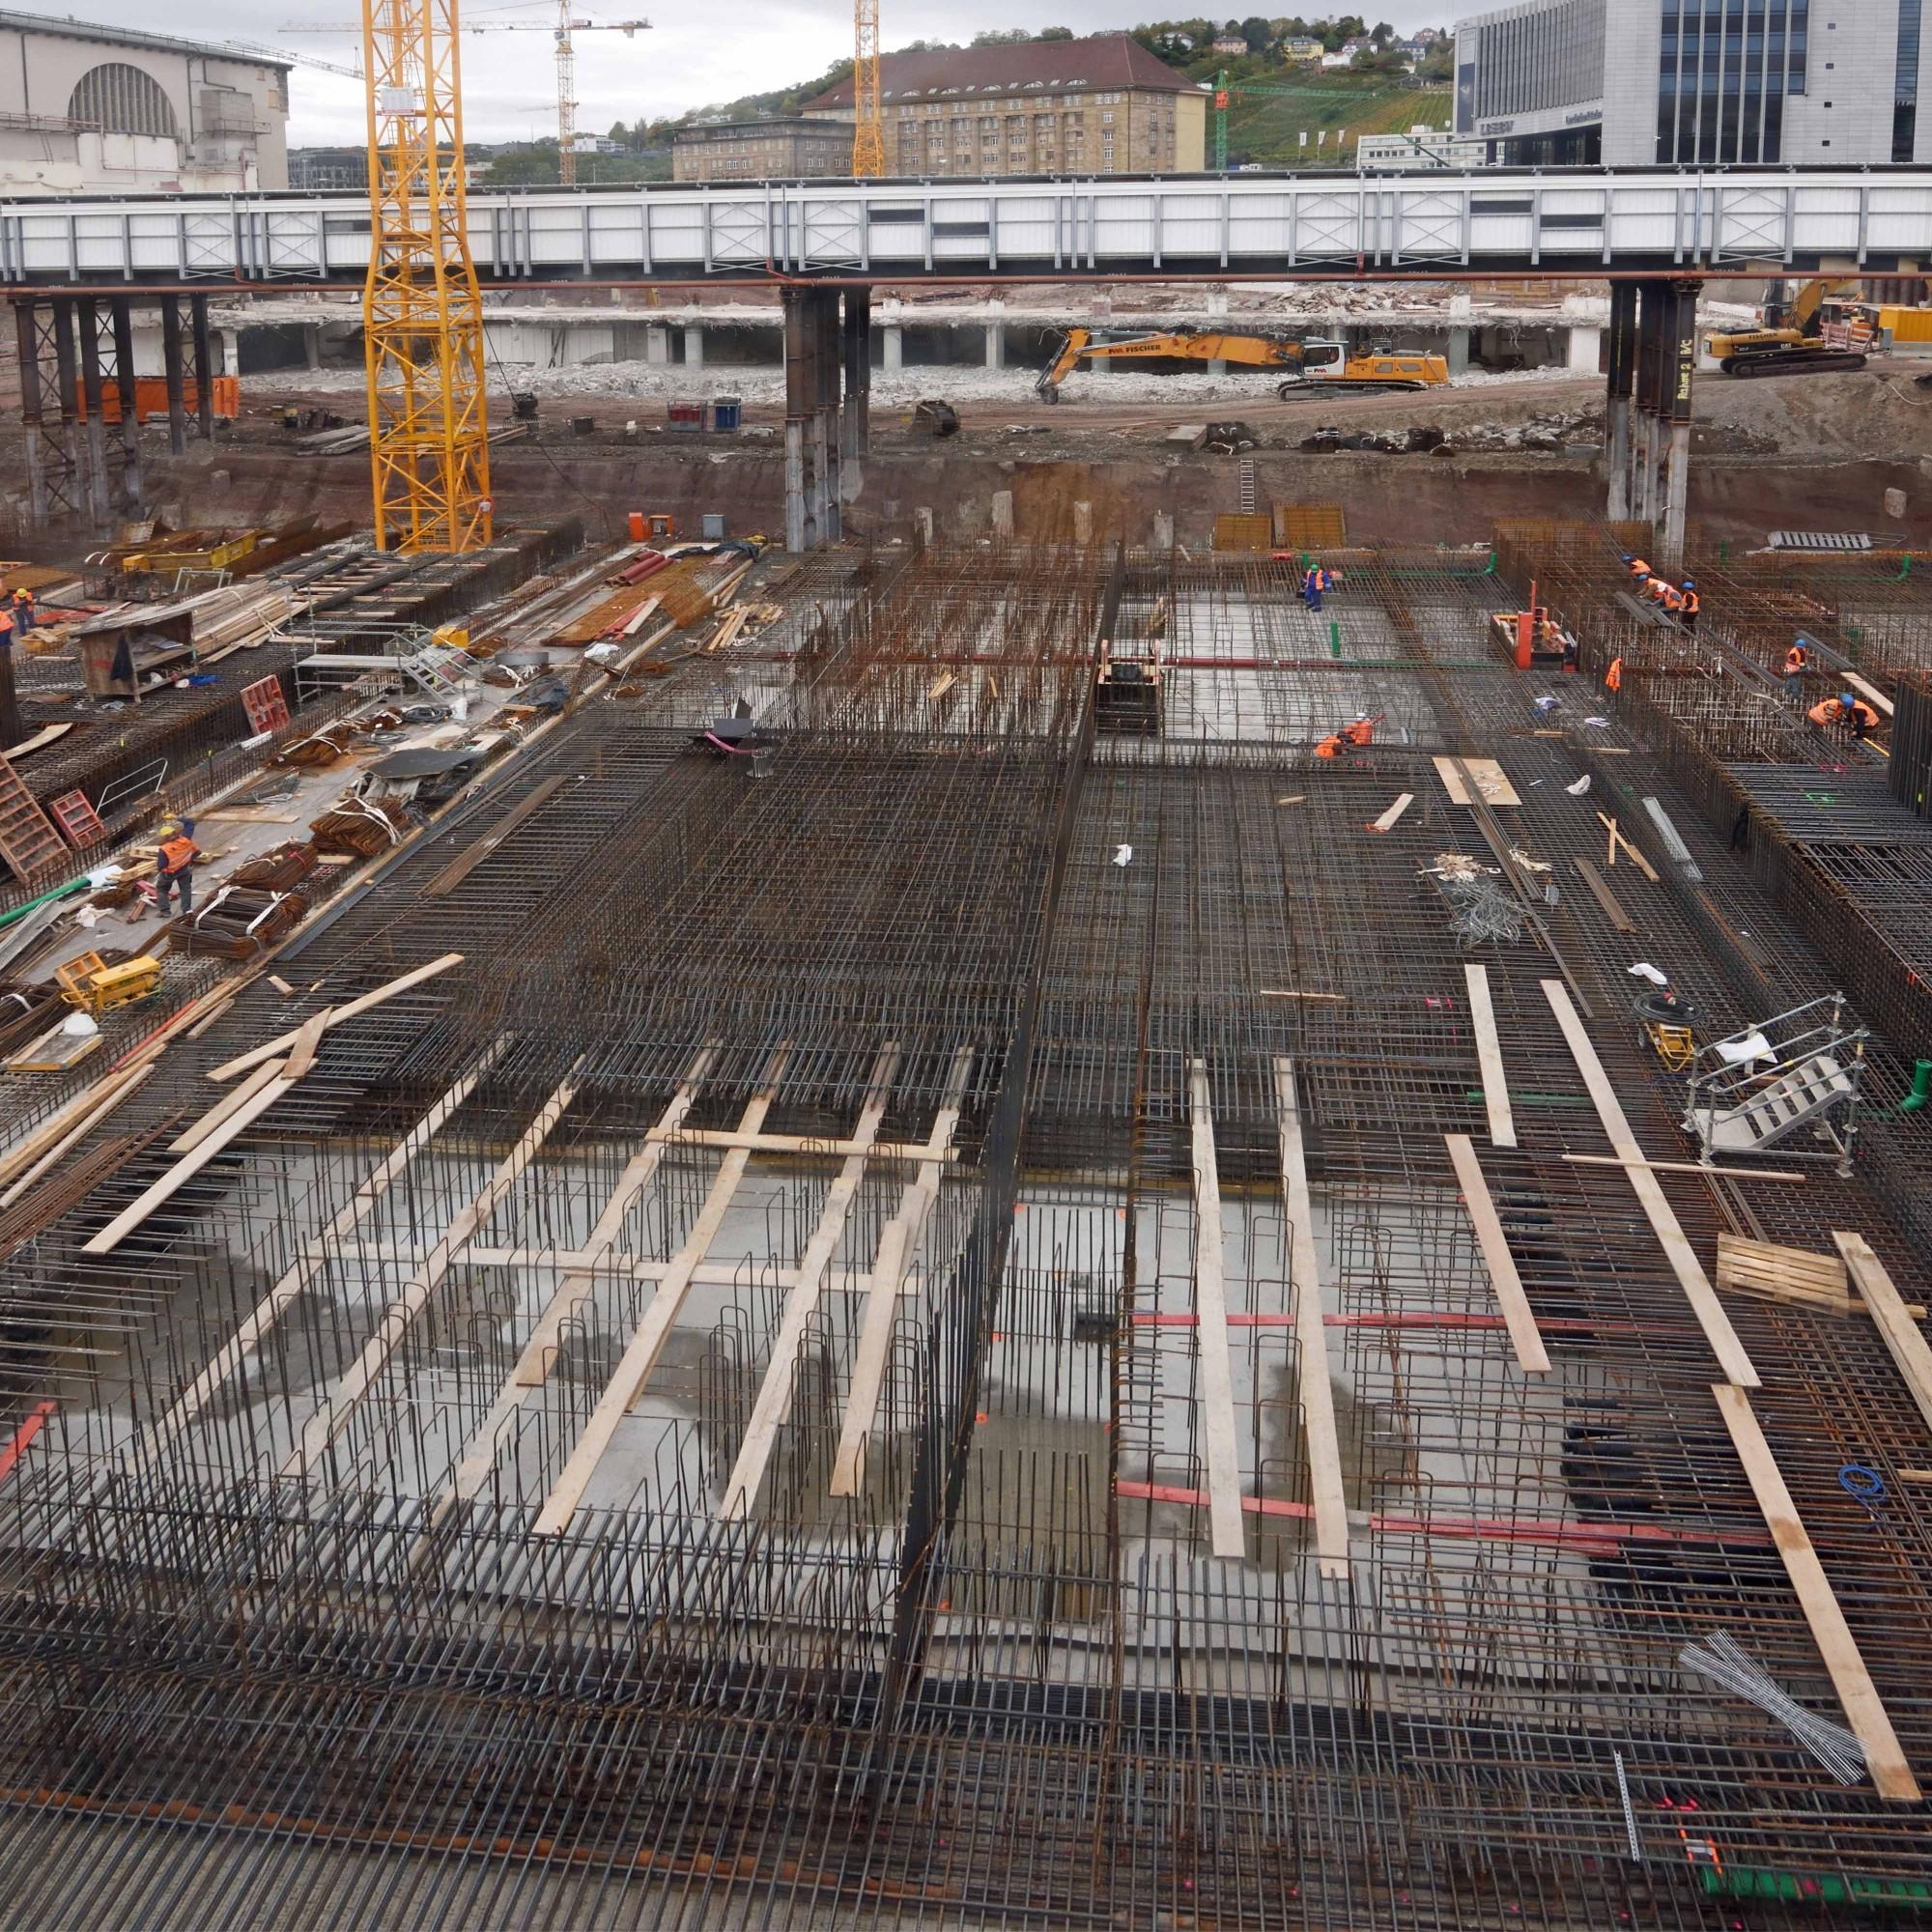 Stuttgart 21, Bauarbeiten am Hauptbahnhof im Oktober 2017.